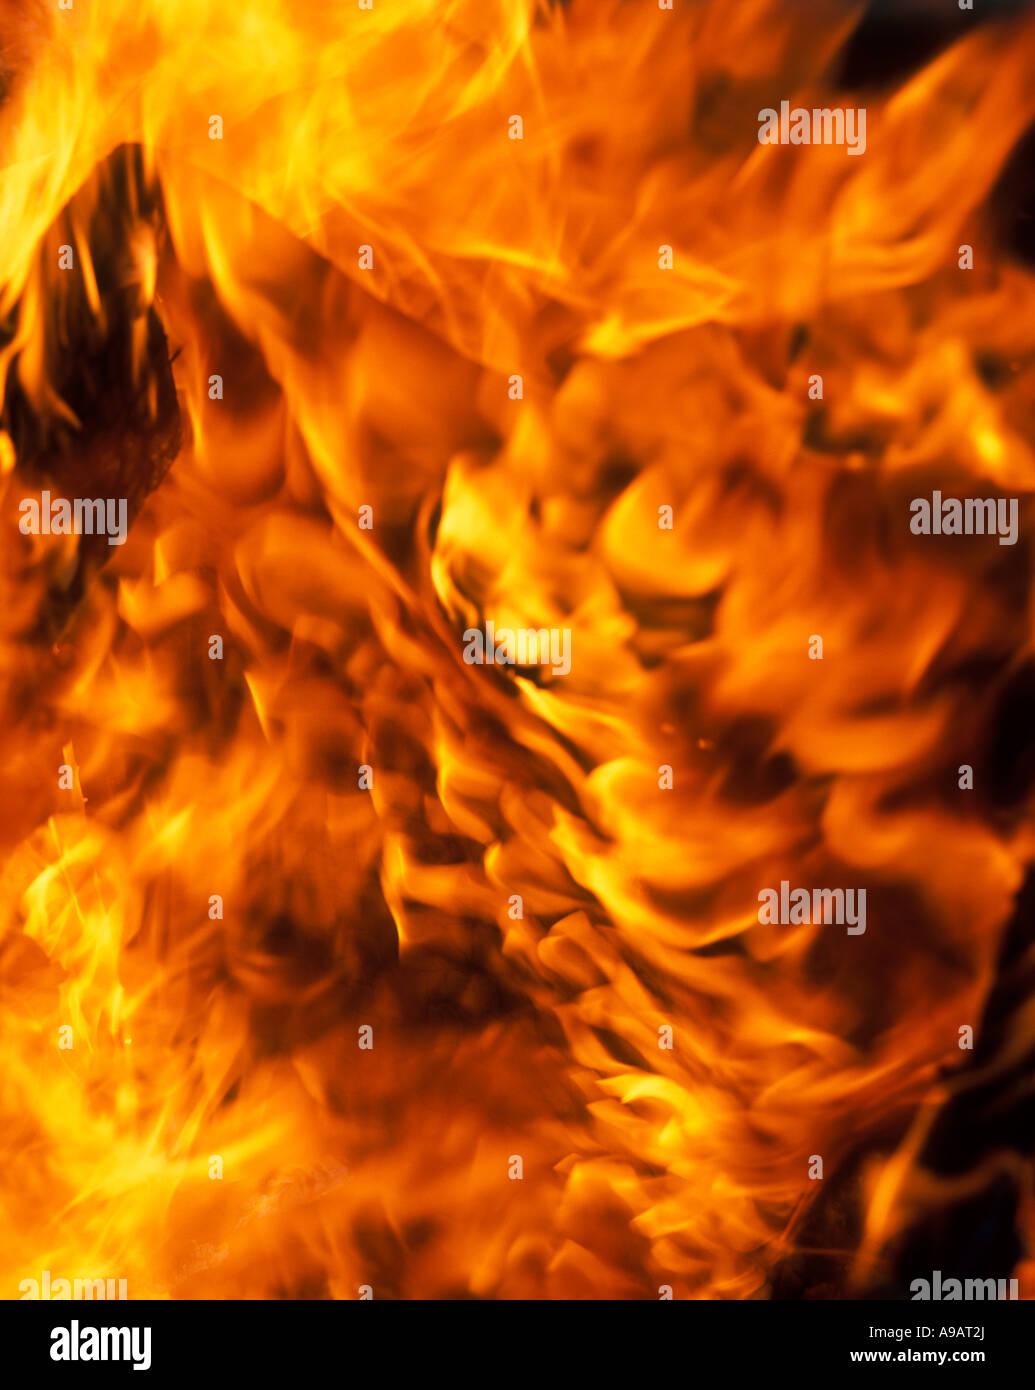 FLAMMES DE FEU Photo Stock